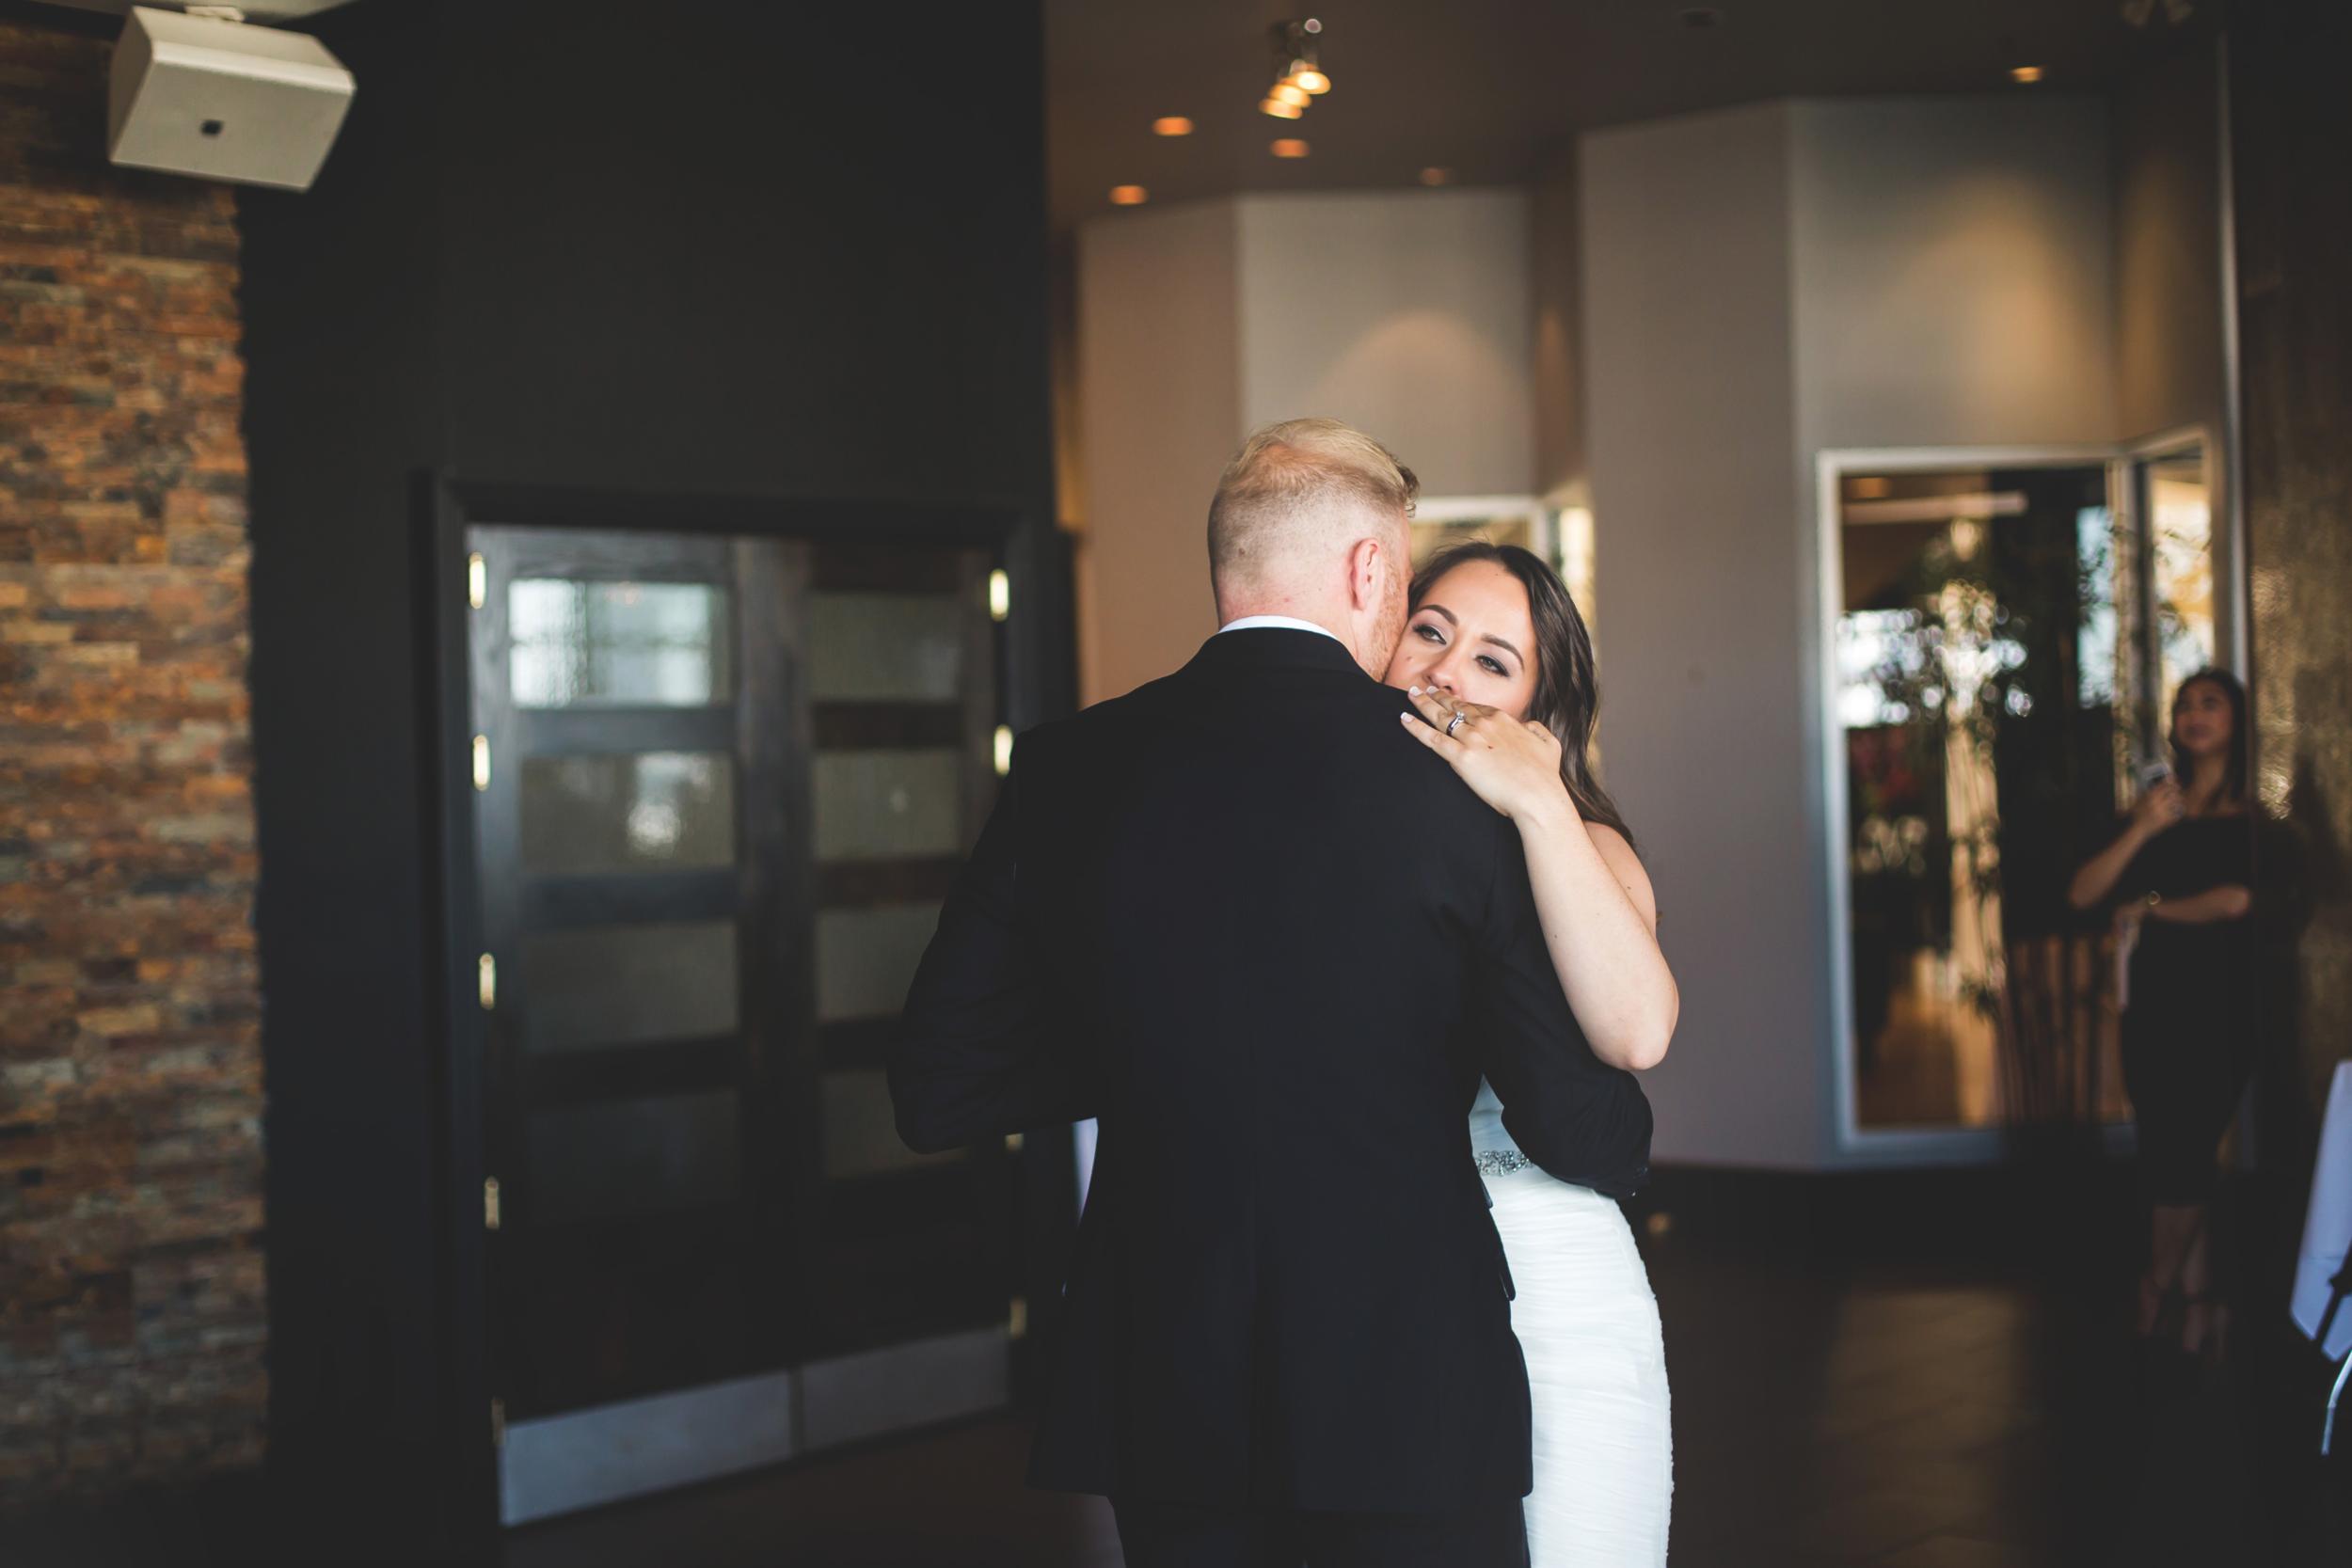 Wedding-Harbour-Banquet-Center-Oakville-Photographer-Wedding-Hamilton-Saint-James-Espresso-Downtown-HamOnt-GTA-Niagara-Toronto-Moments-by-Lauren-Photography-Photo-Image-55.png